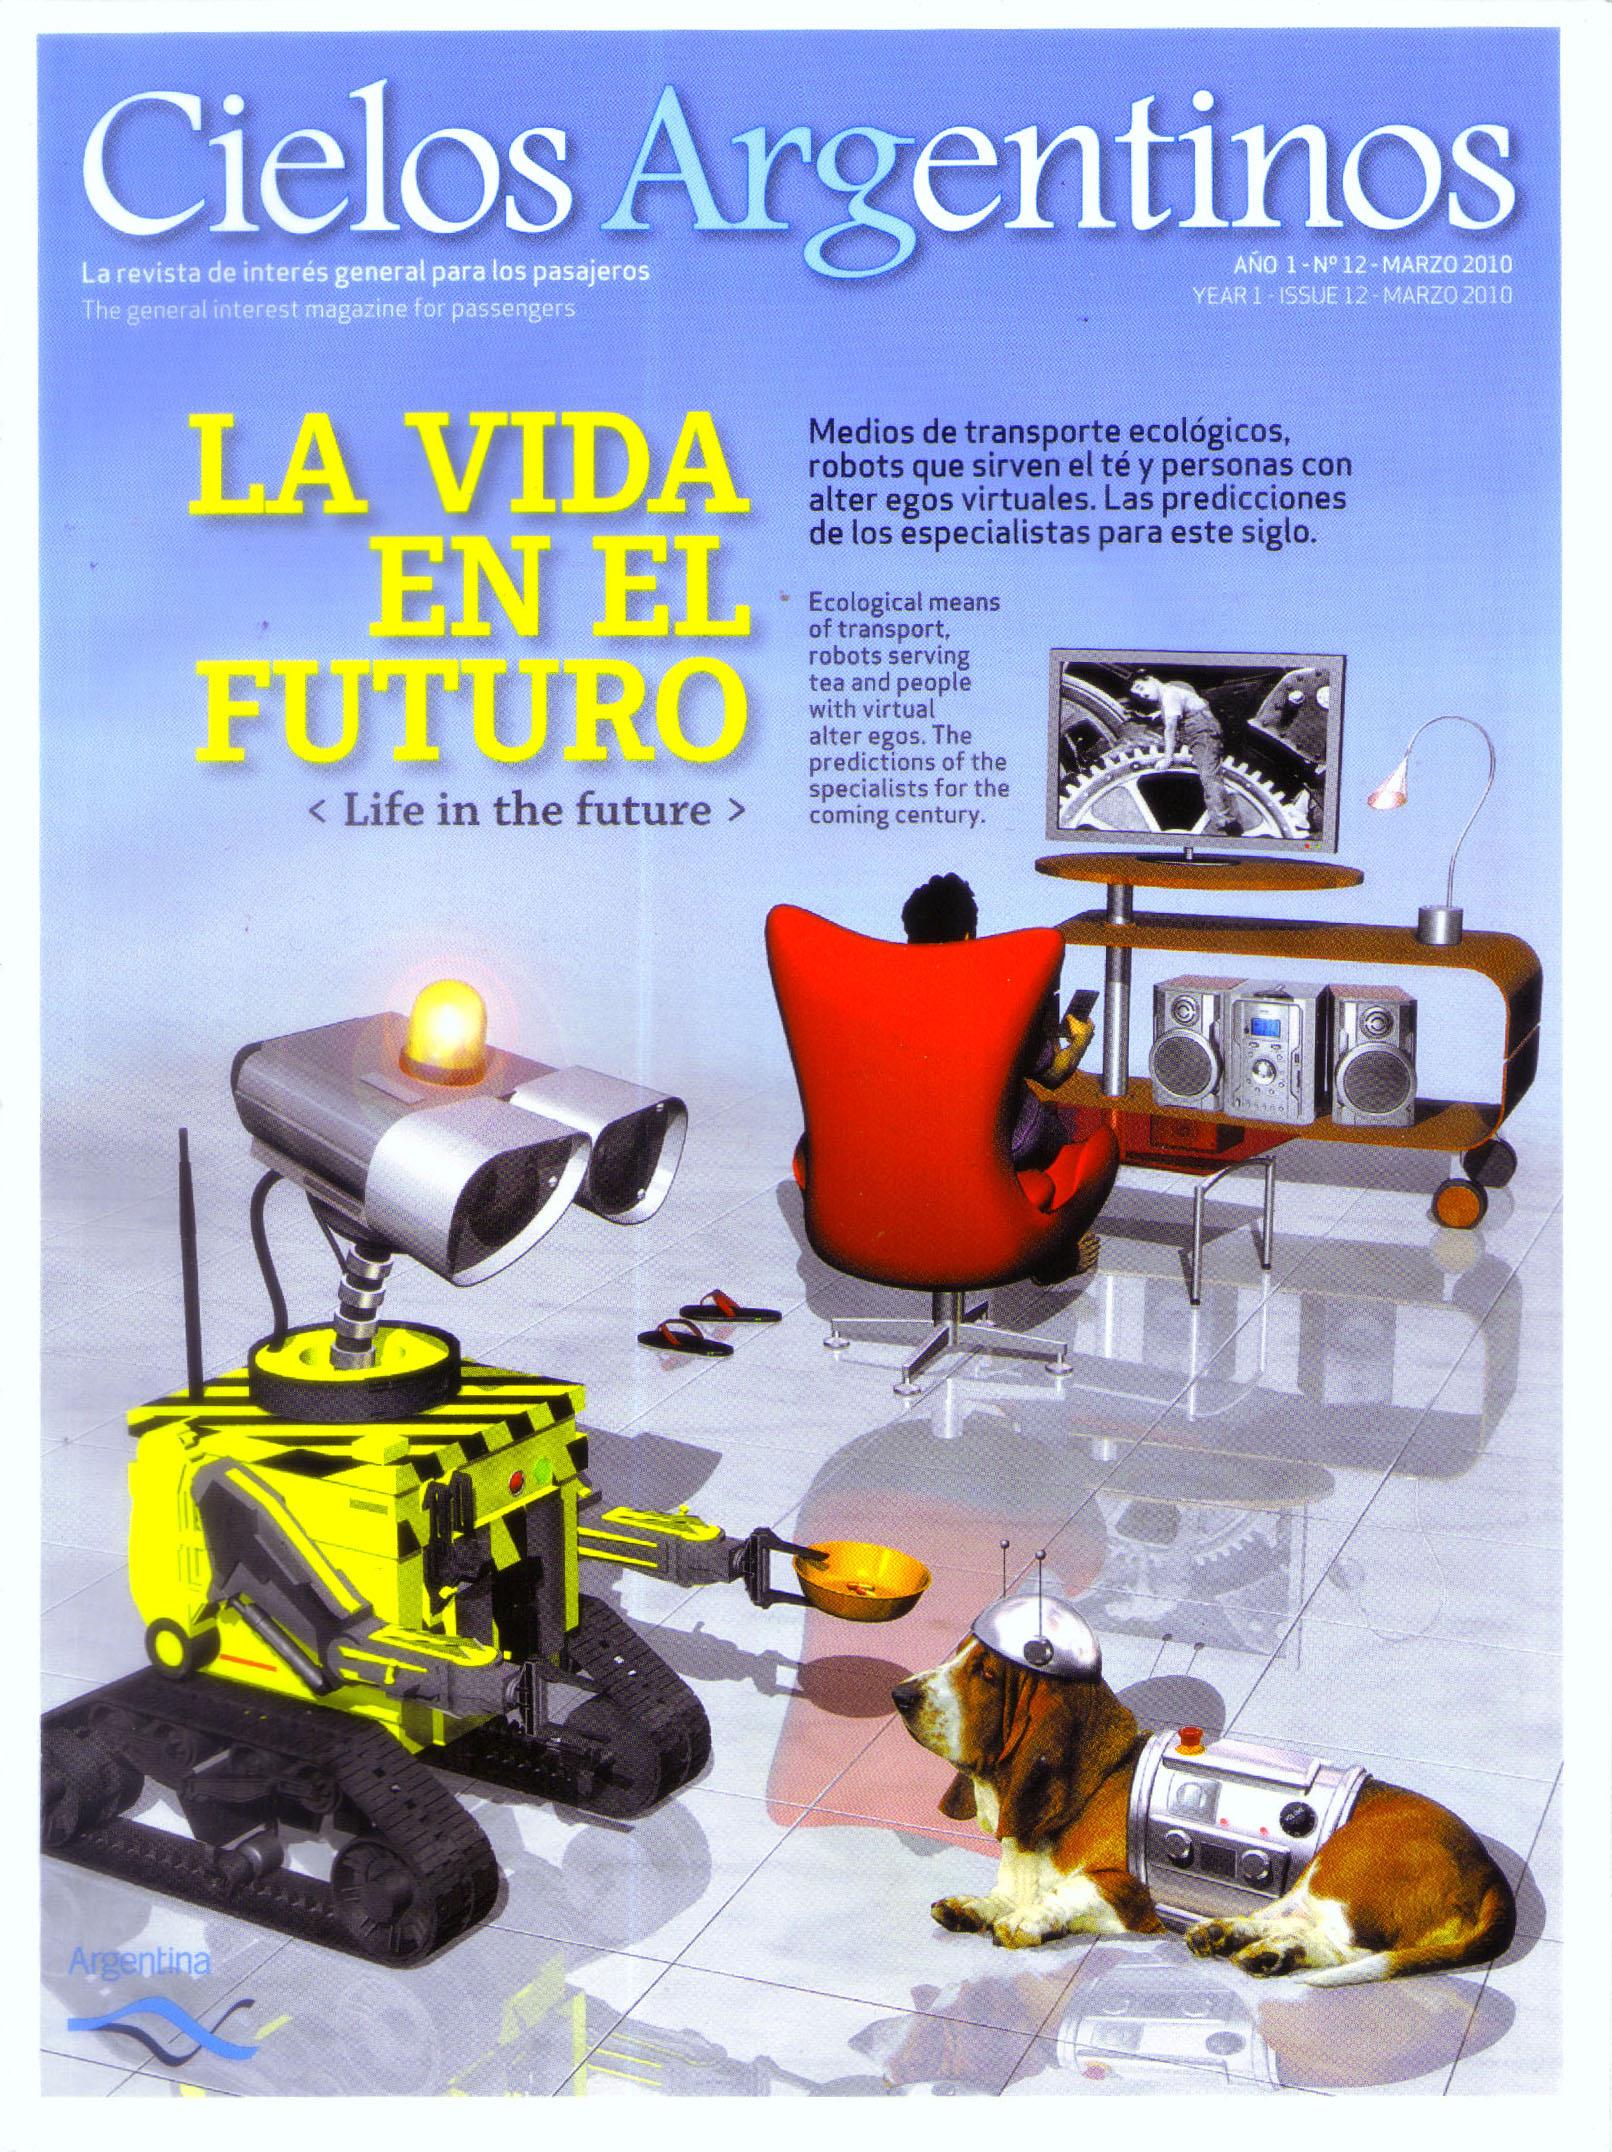 LA VIDA DEL FUTURA